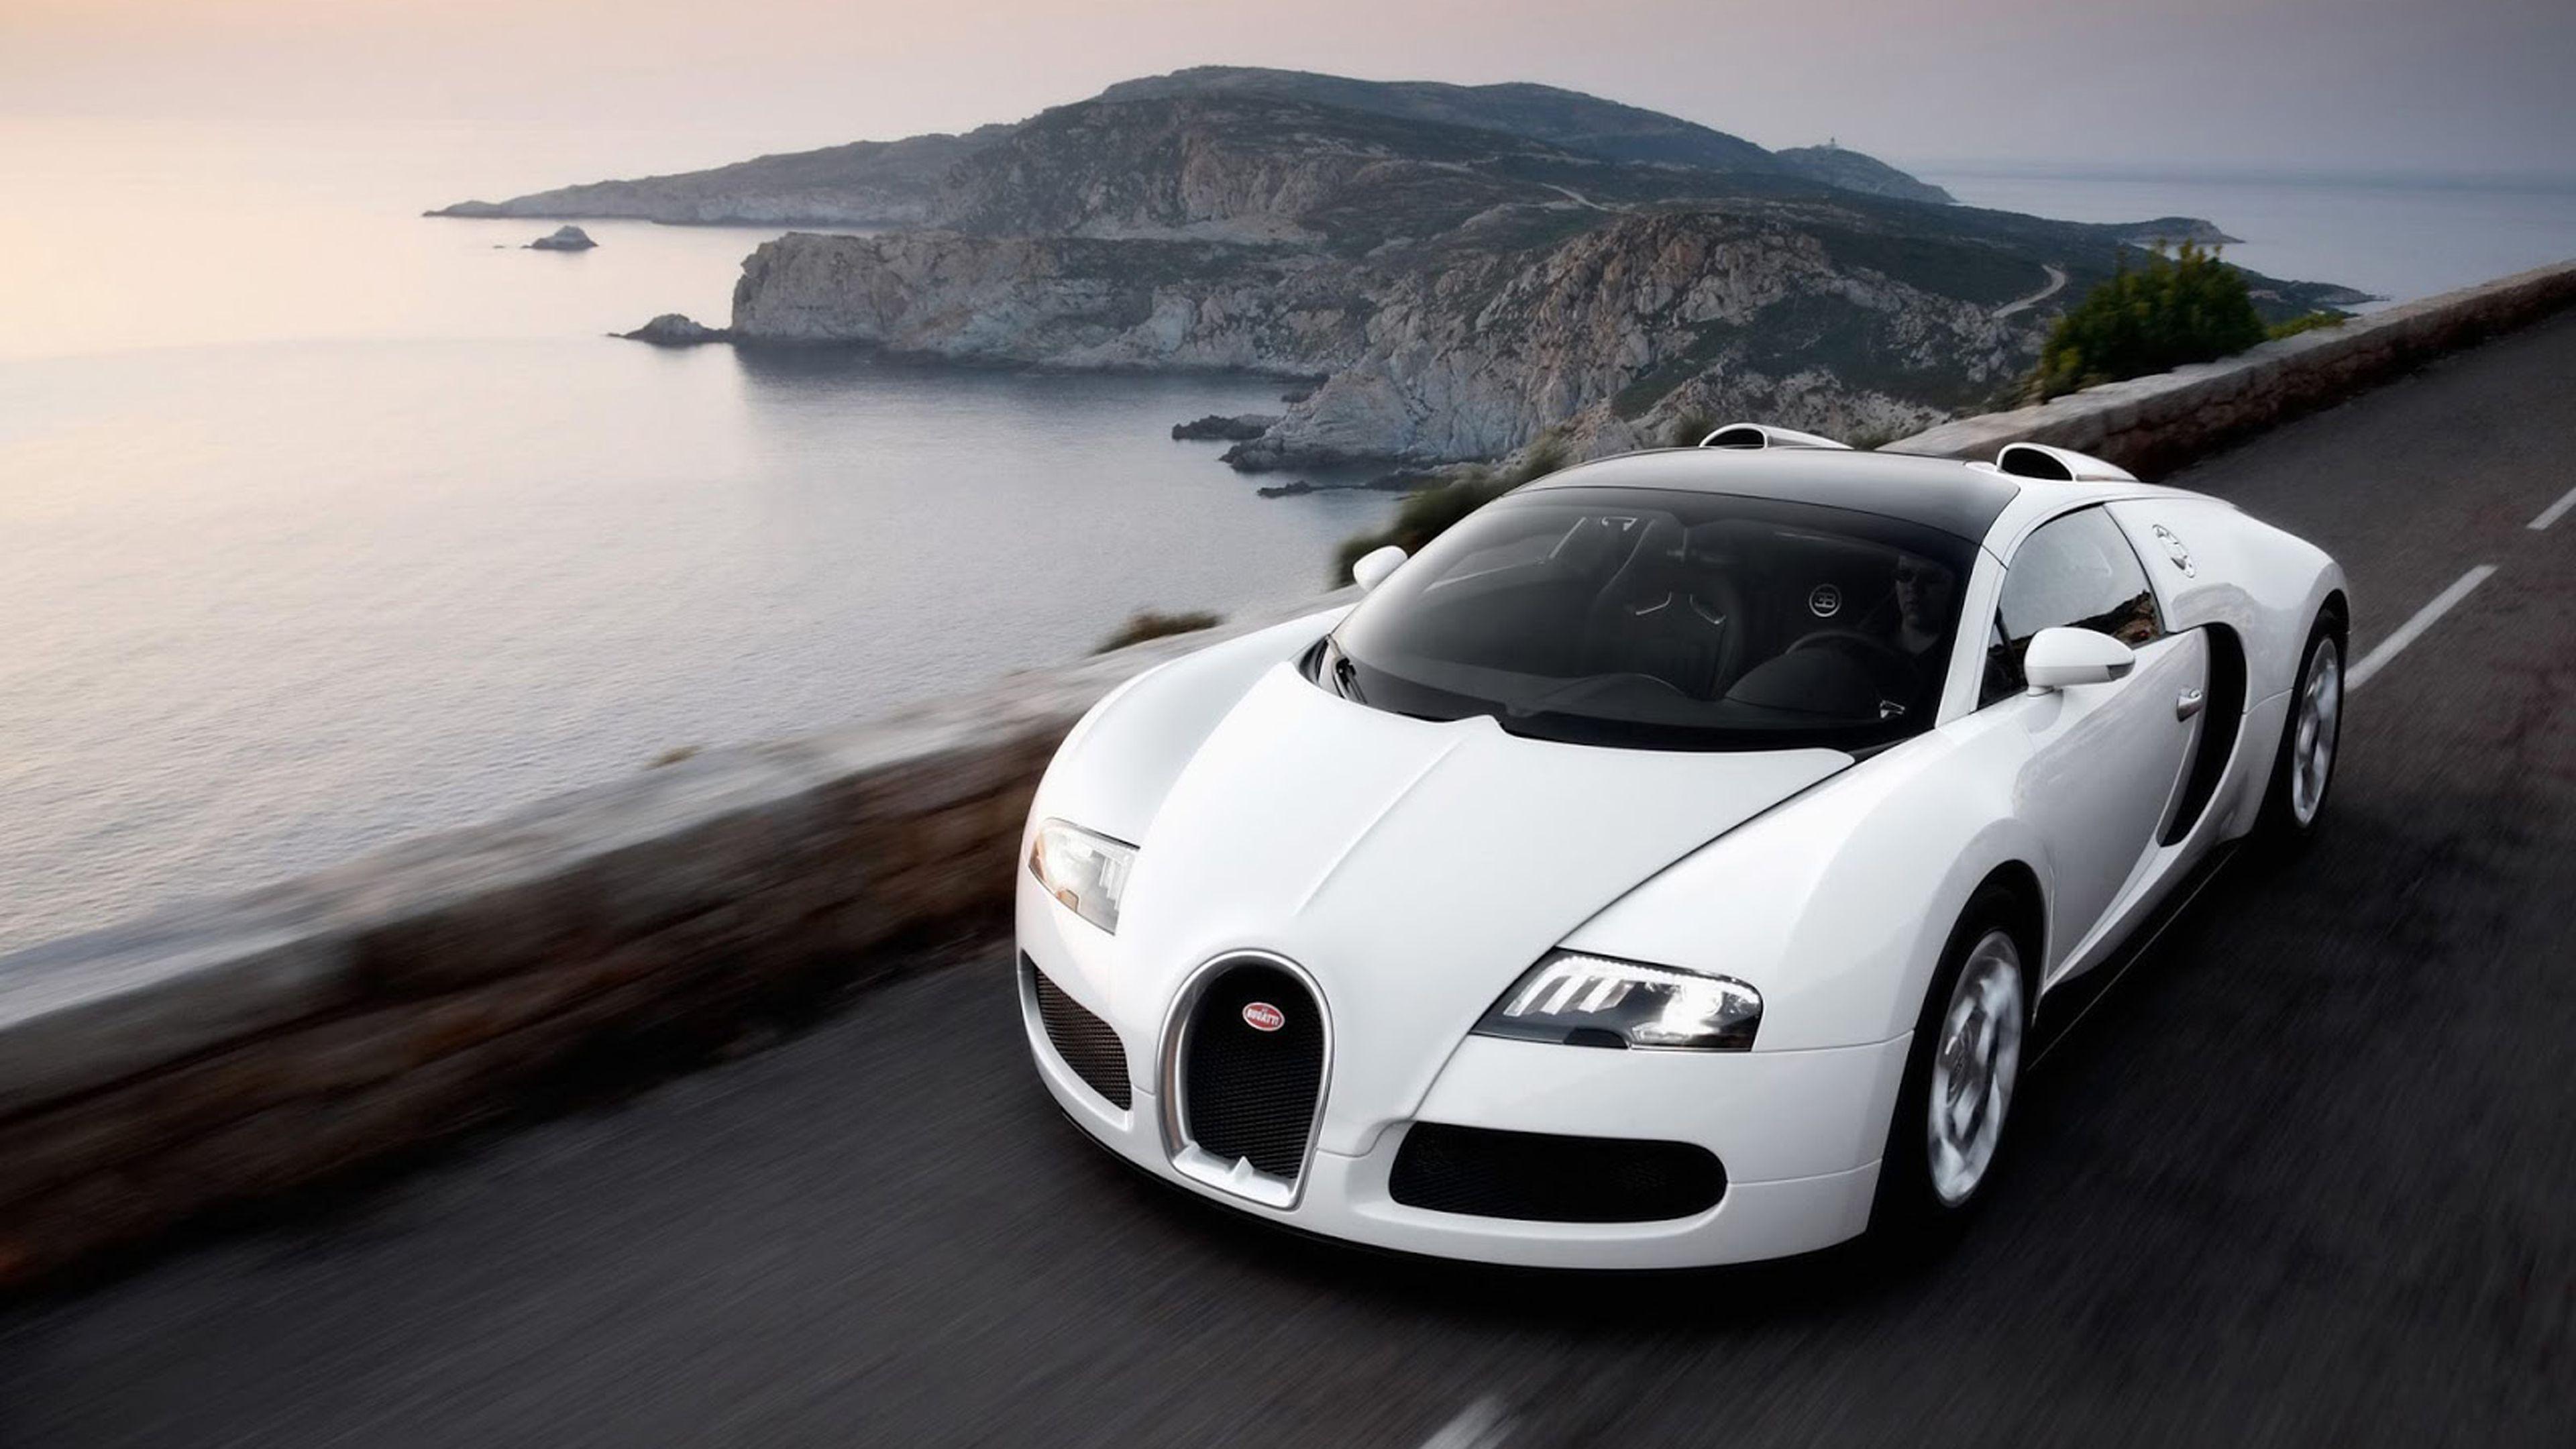 bugatti veyron hd 4k wallpaper | cars | pinterest | bugatti veyron